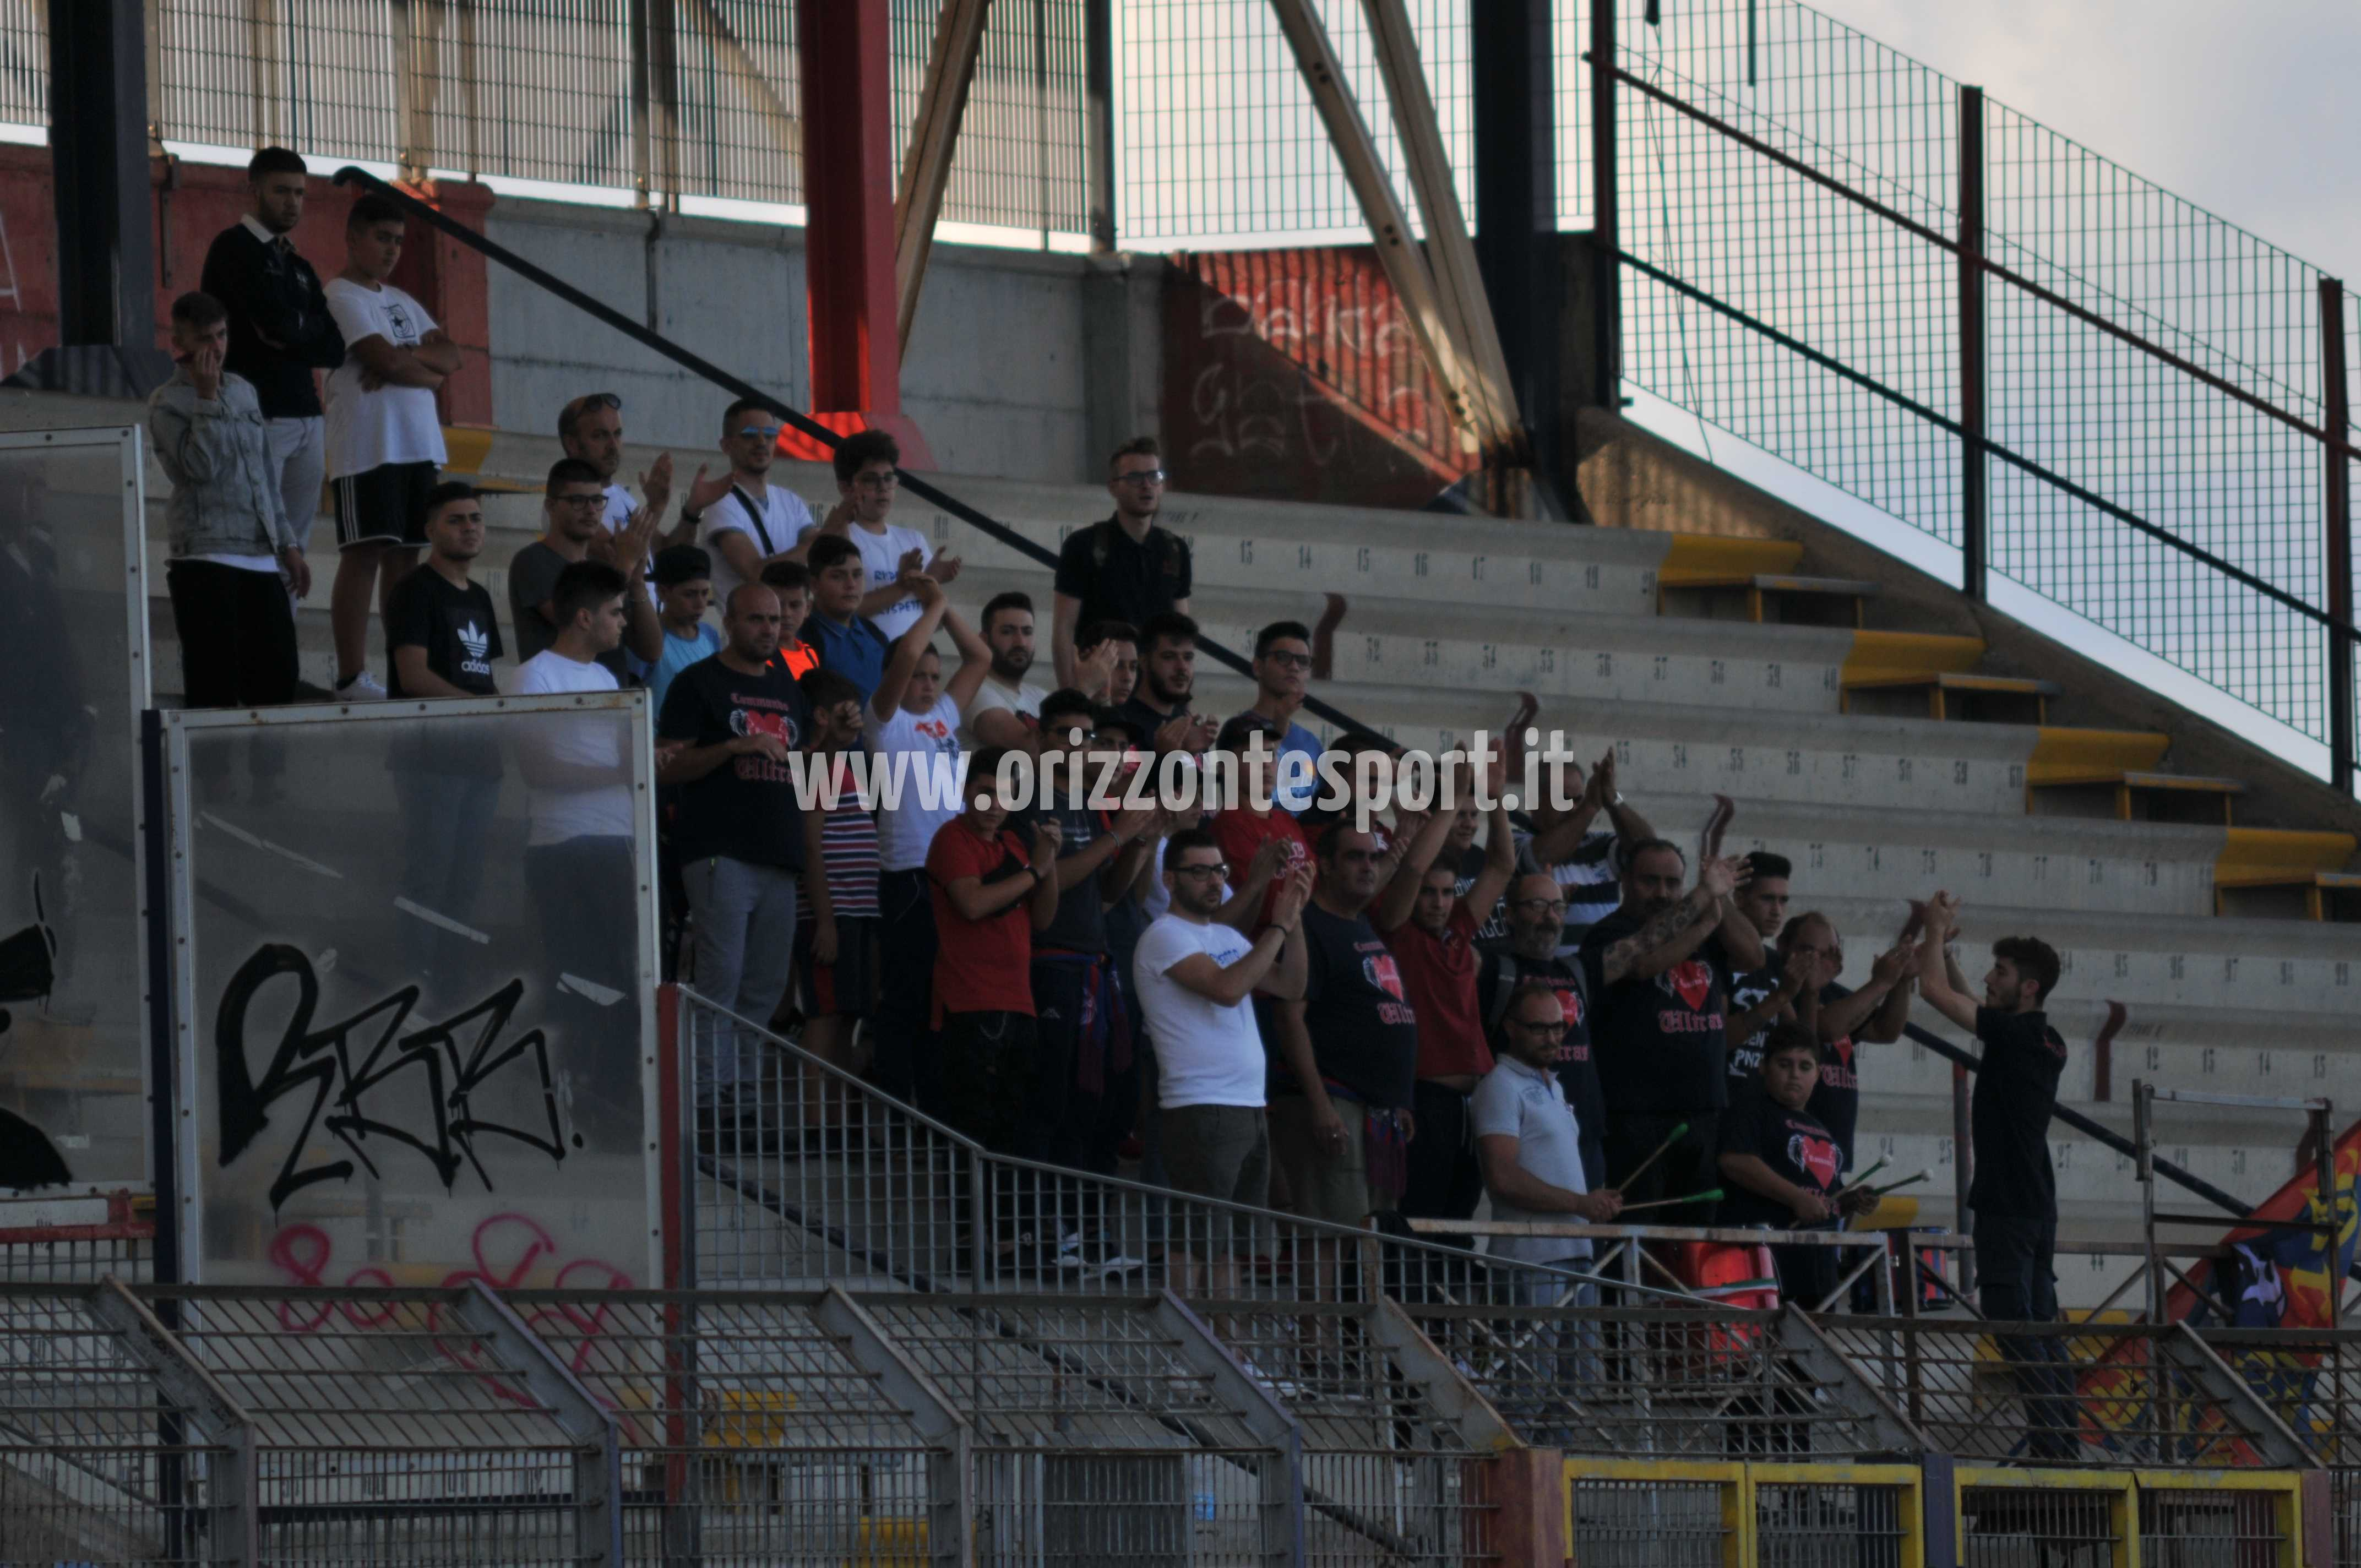 rossanese_praiatrtora_cpppa_italia (27)